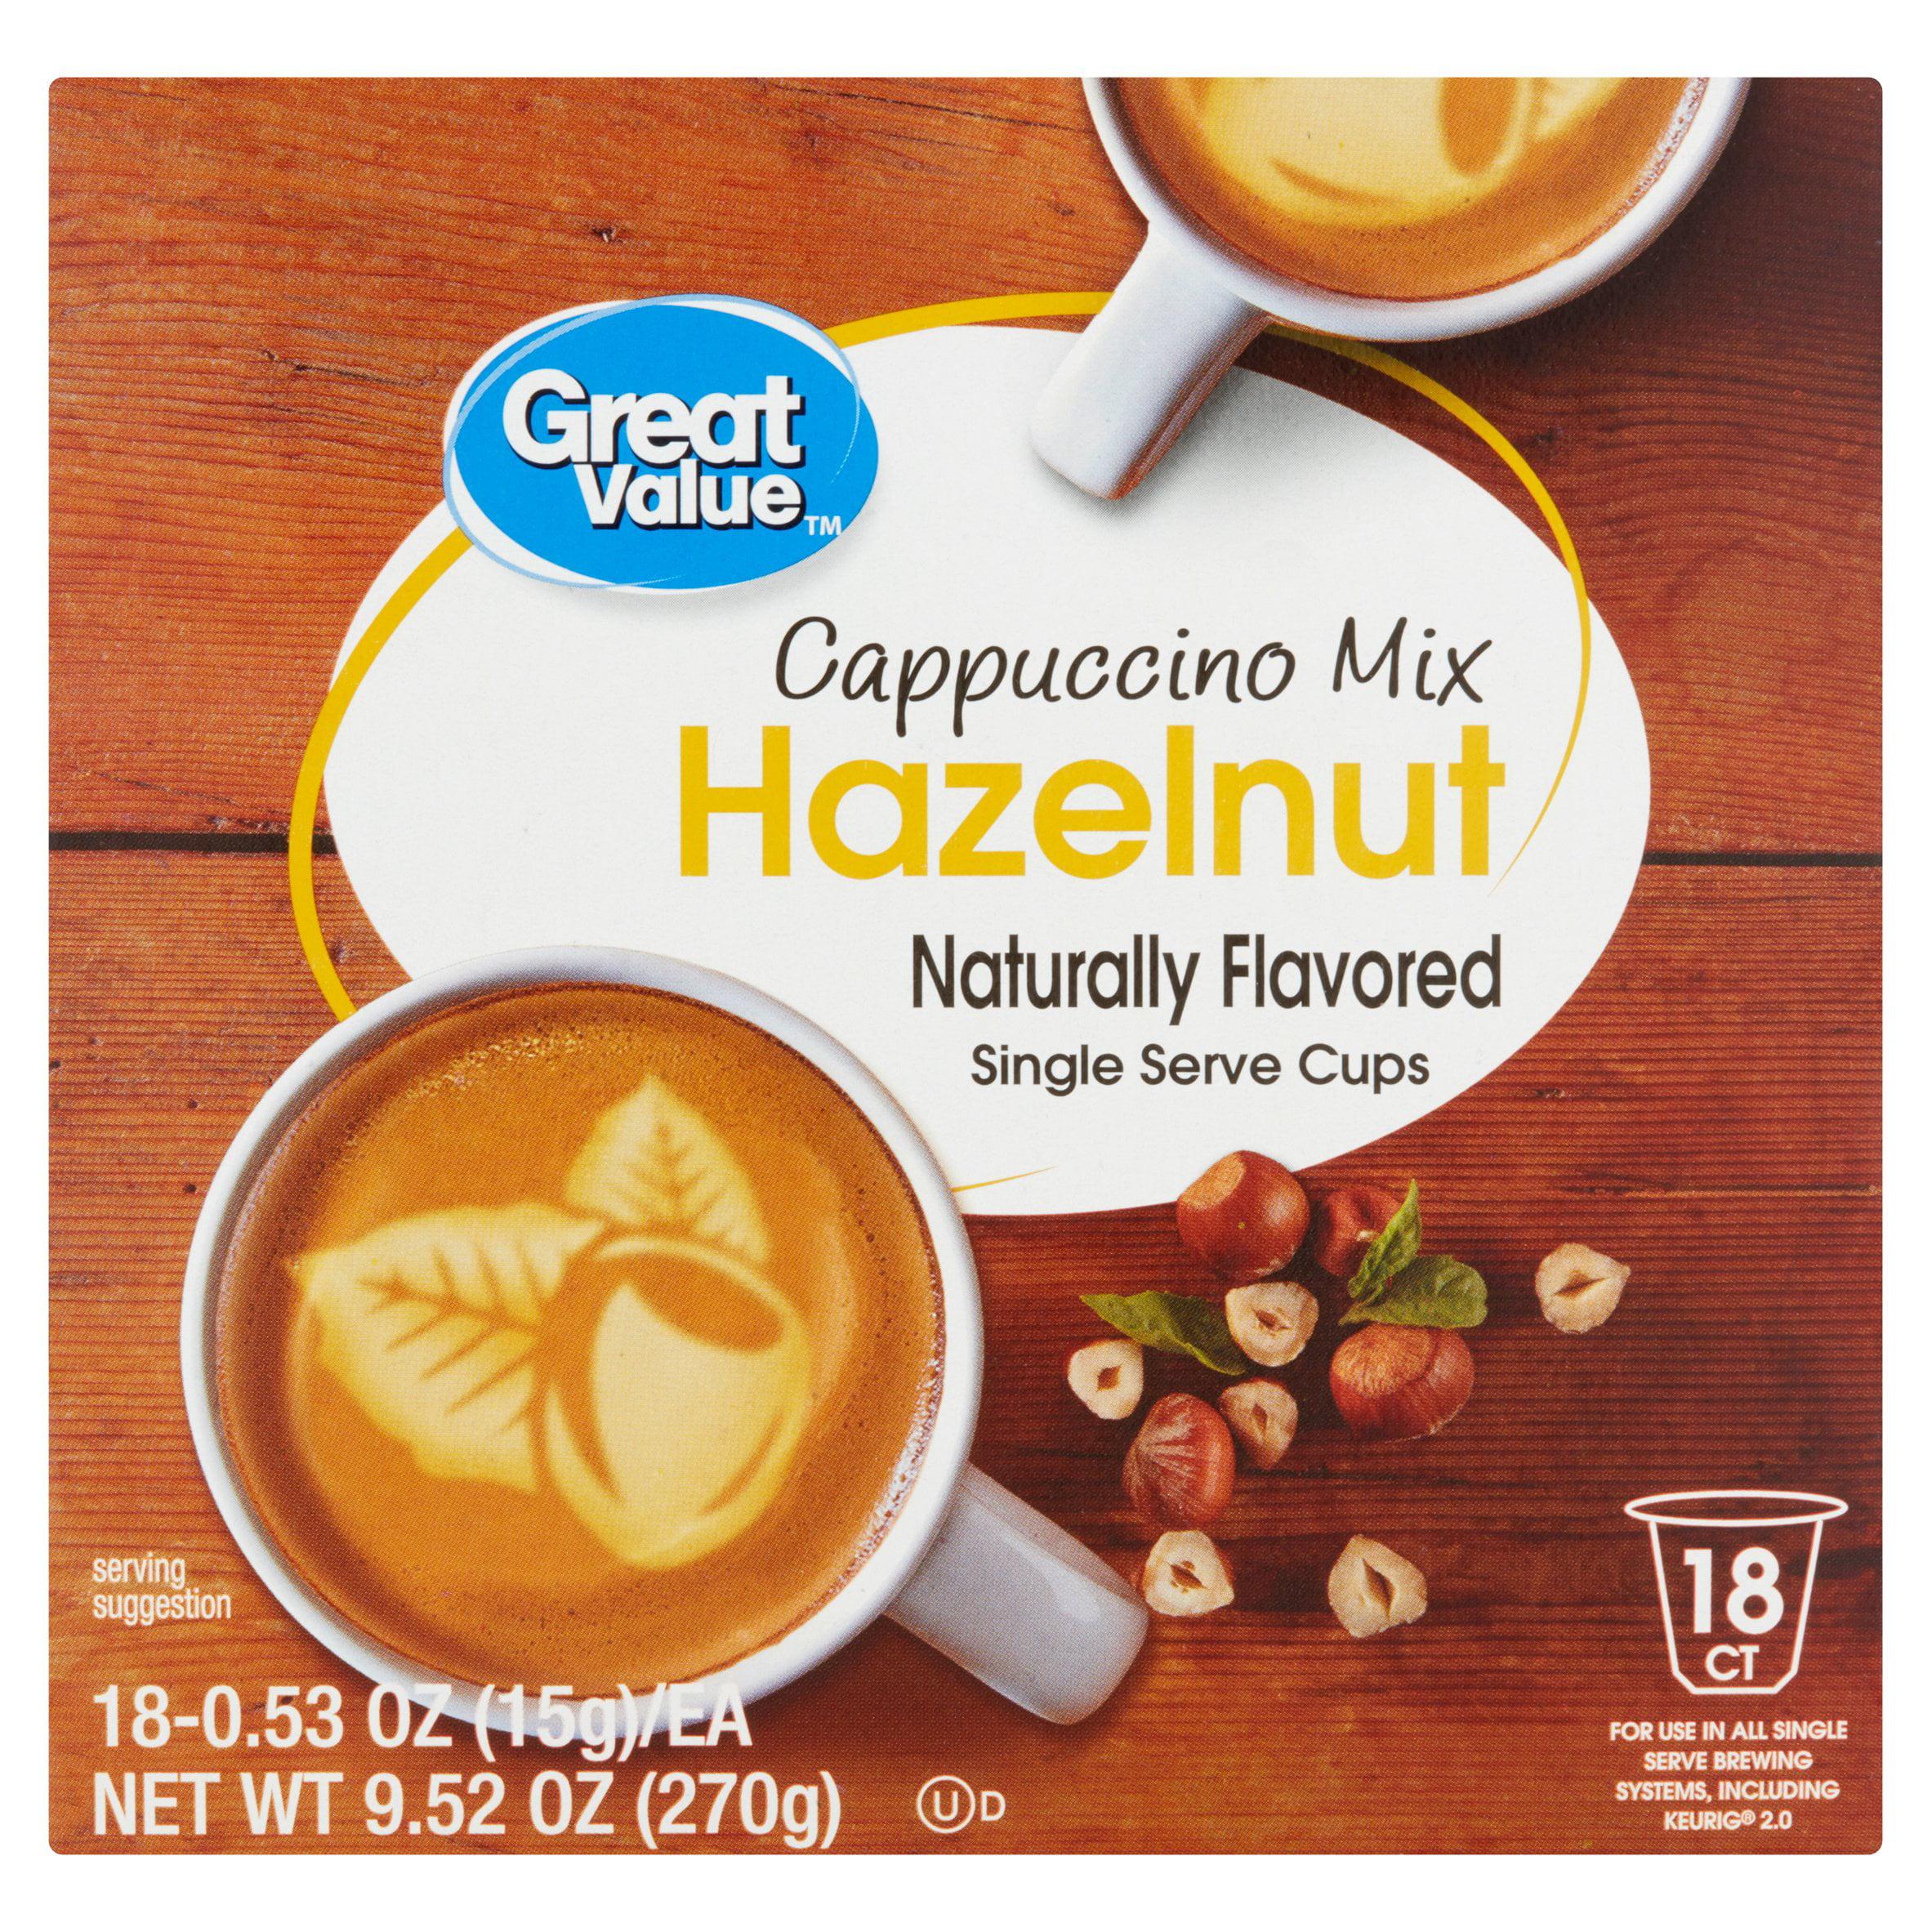 Great Value Hazelnut Cappuccino Mix Single Serve Cups, 18 Count    Walmart.com